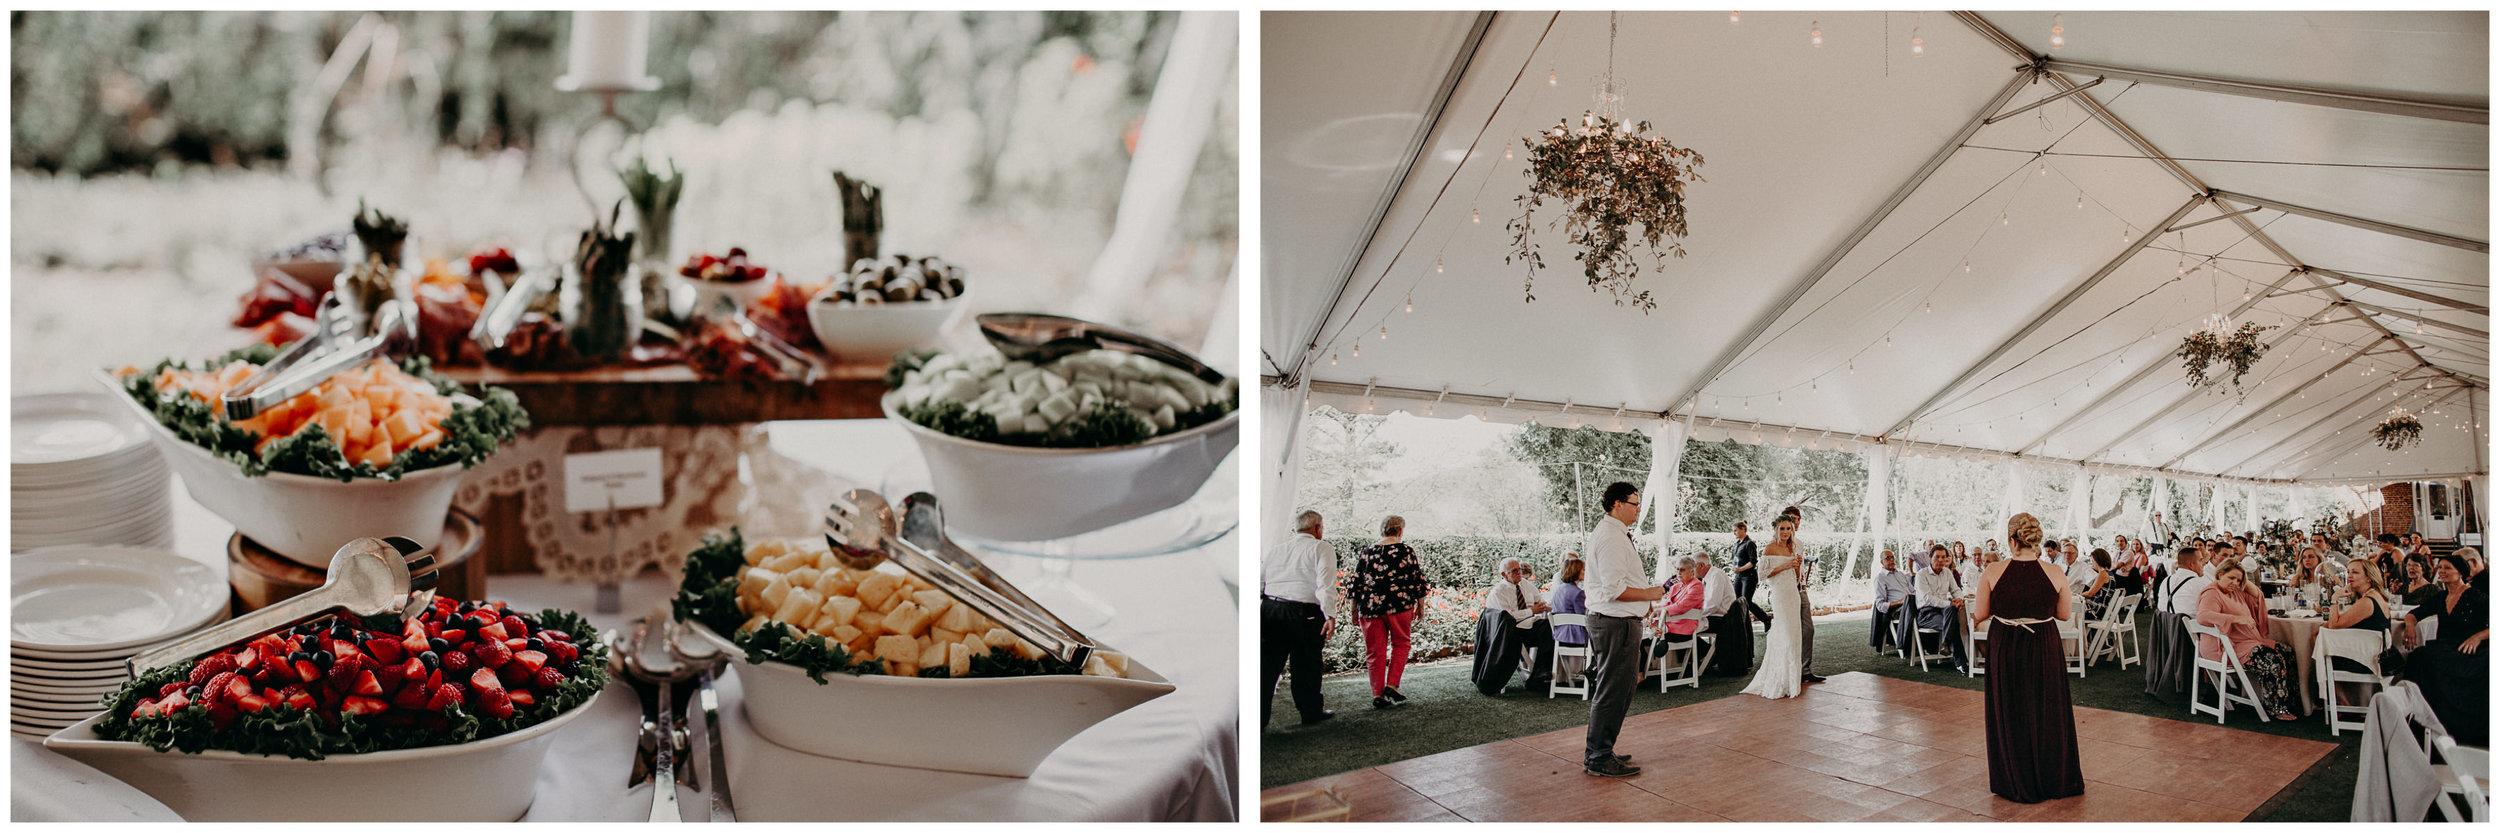 118 - Barnsley Gardens Wedding -Bride and groom portraits - Atlanta wedding photographer .jpg